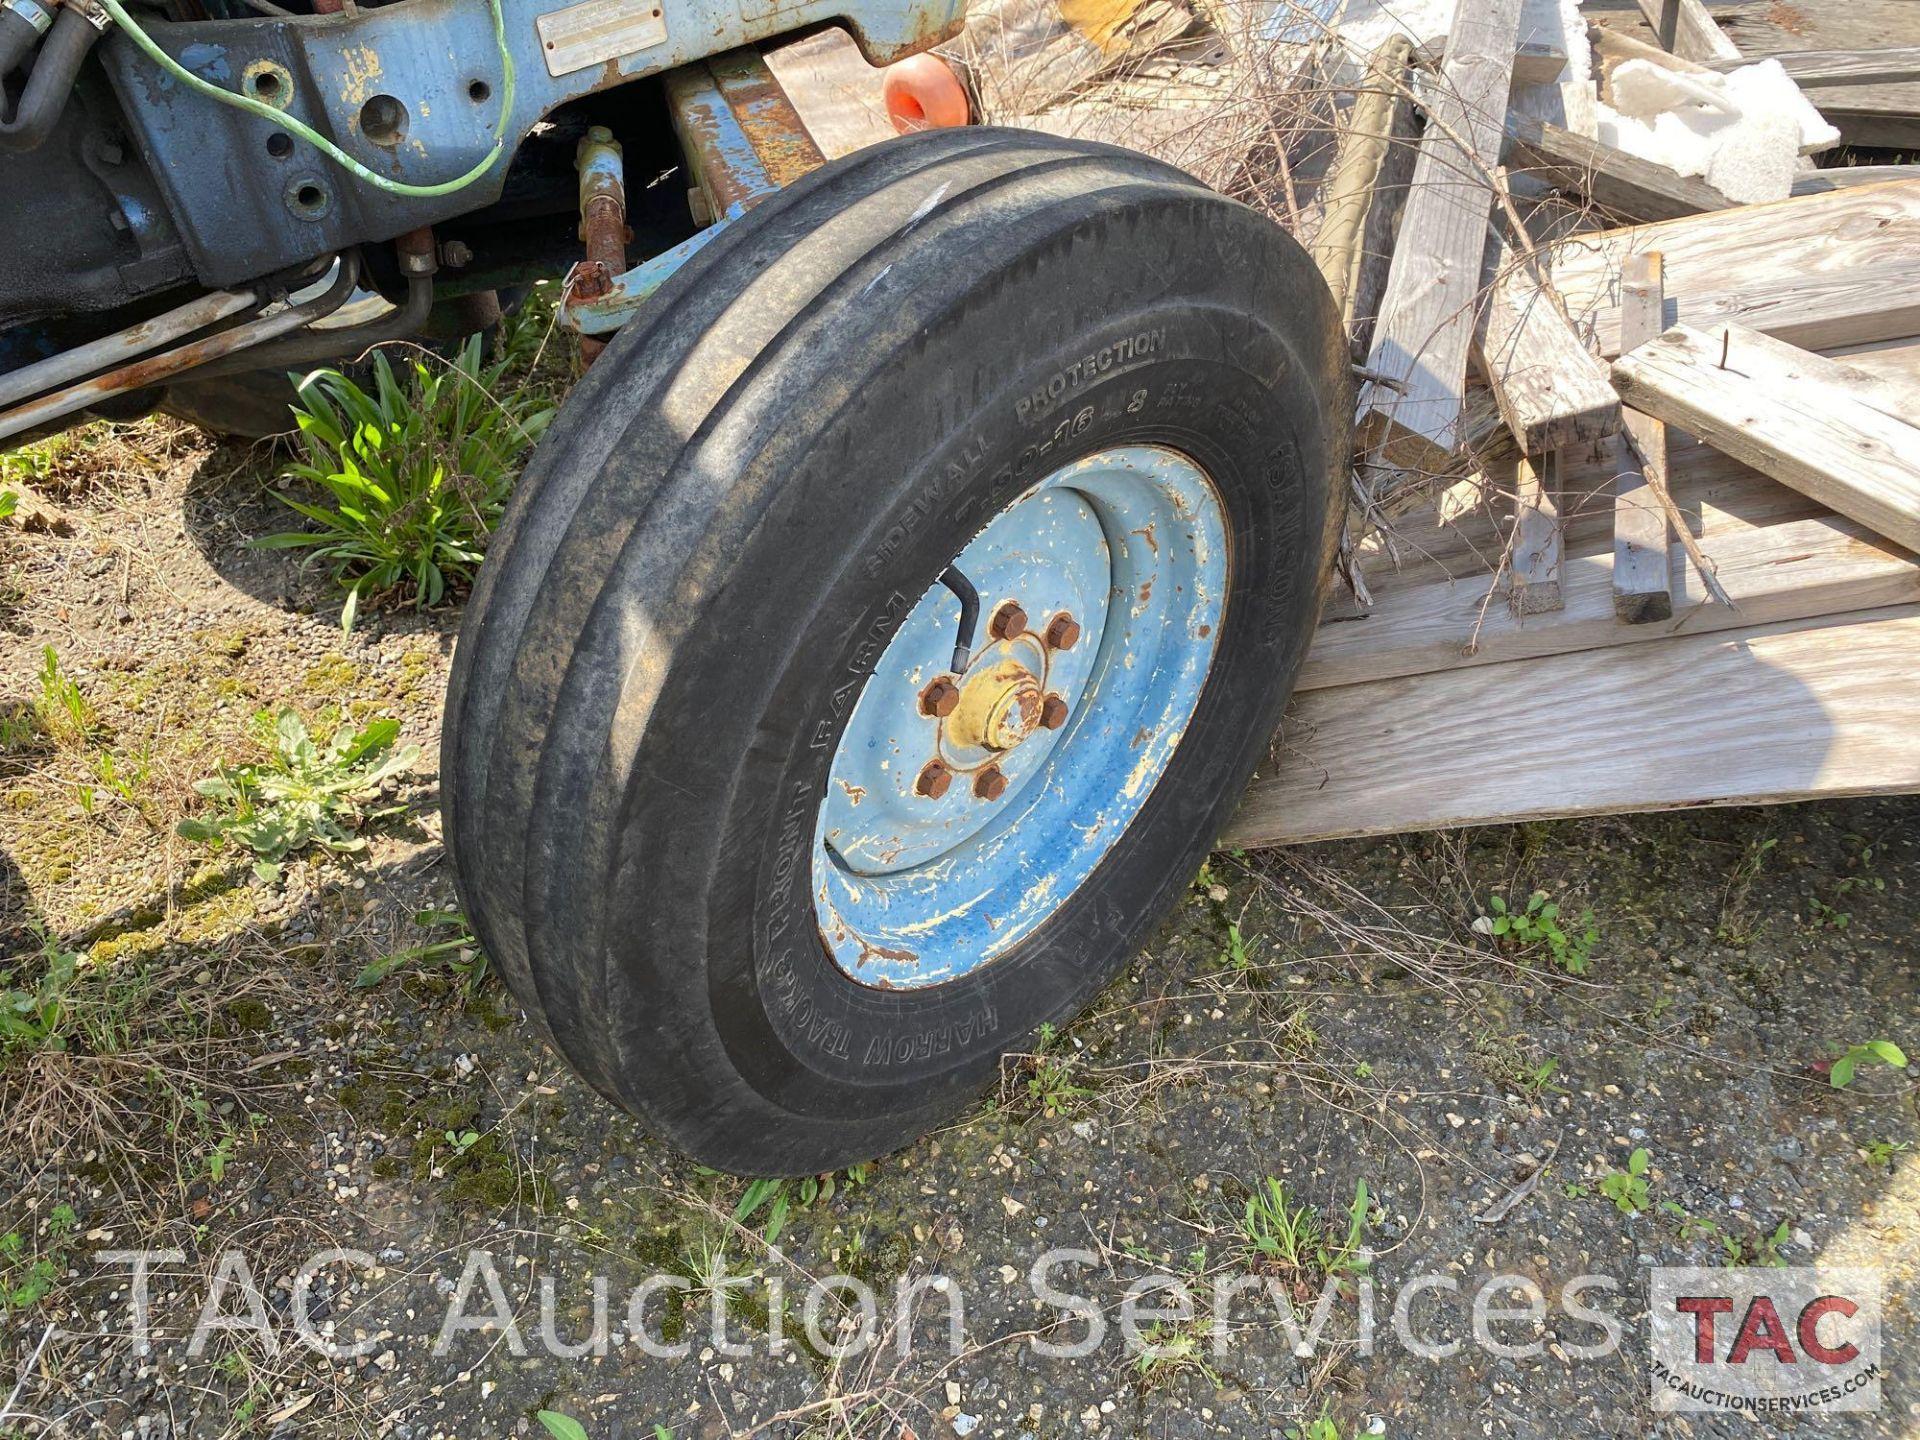 John Deere 2150 Farm Tractor - Image 31 of 34